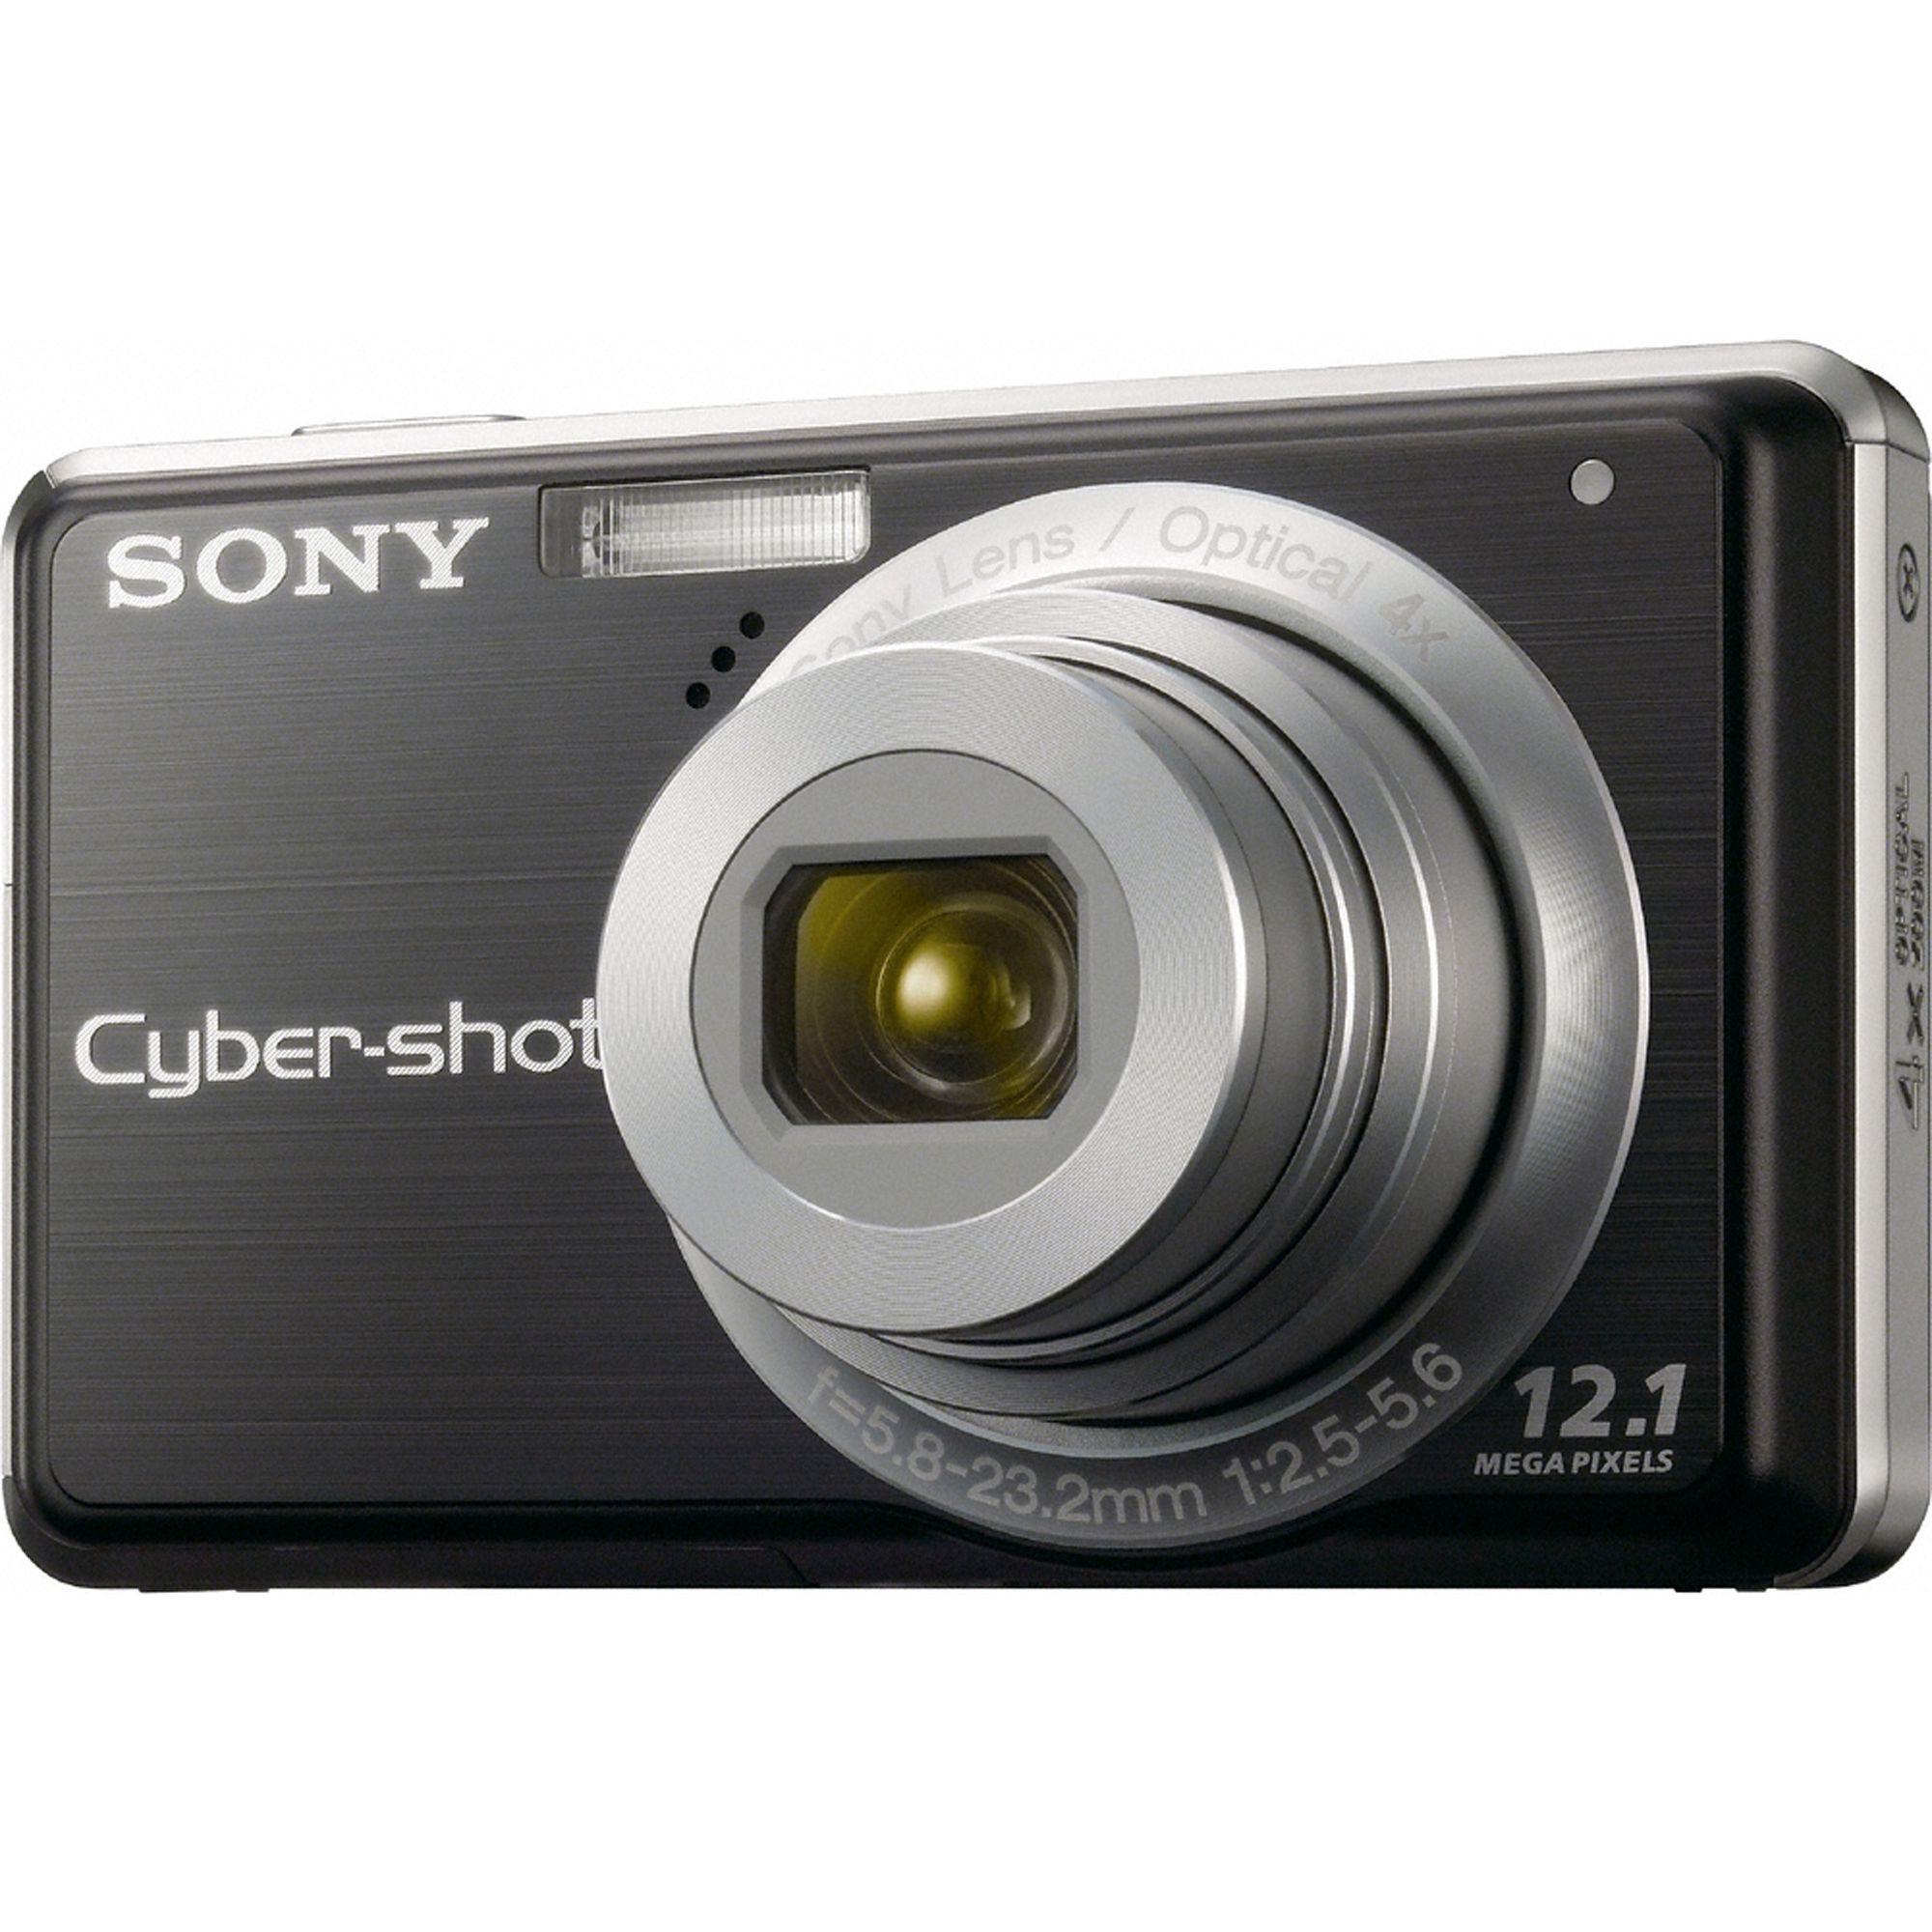 Sony Cyber-shot® 12.1 Megapixel 4X Optical Zoom Digital Camera - Black PartNumber: 020W369247110001P KsnValue: 020W369247110001 MfgPartNumber: DSCS980/B